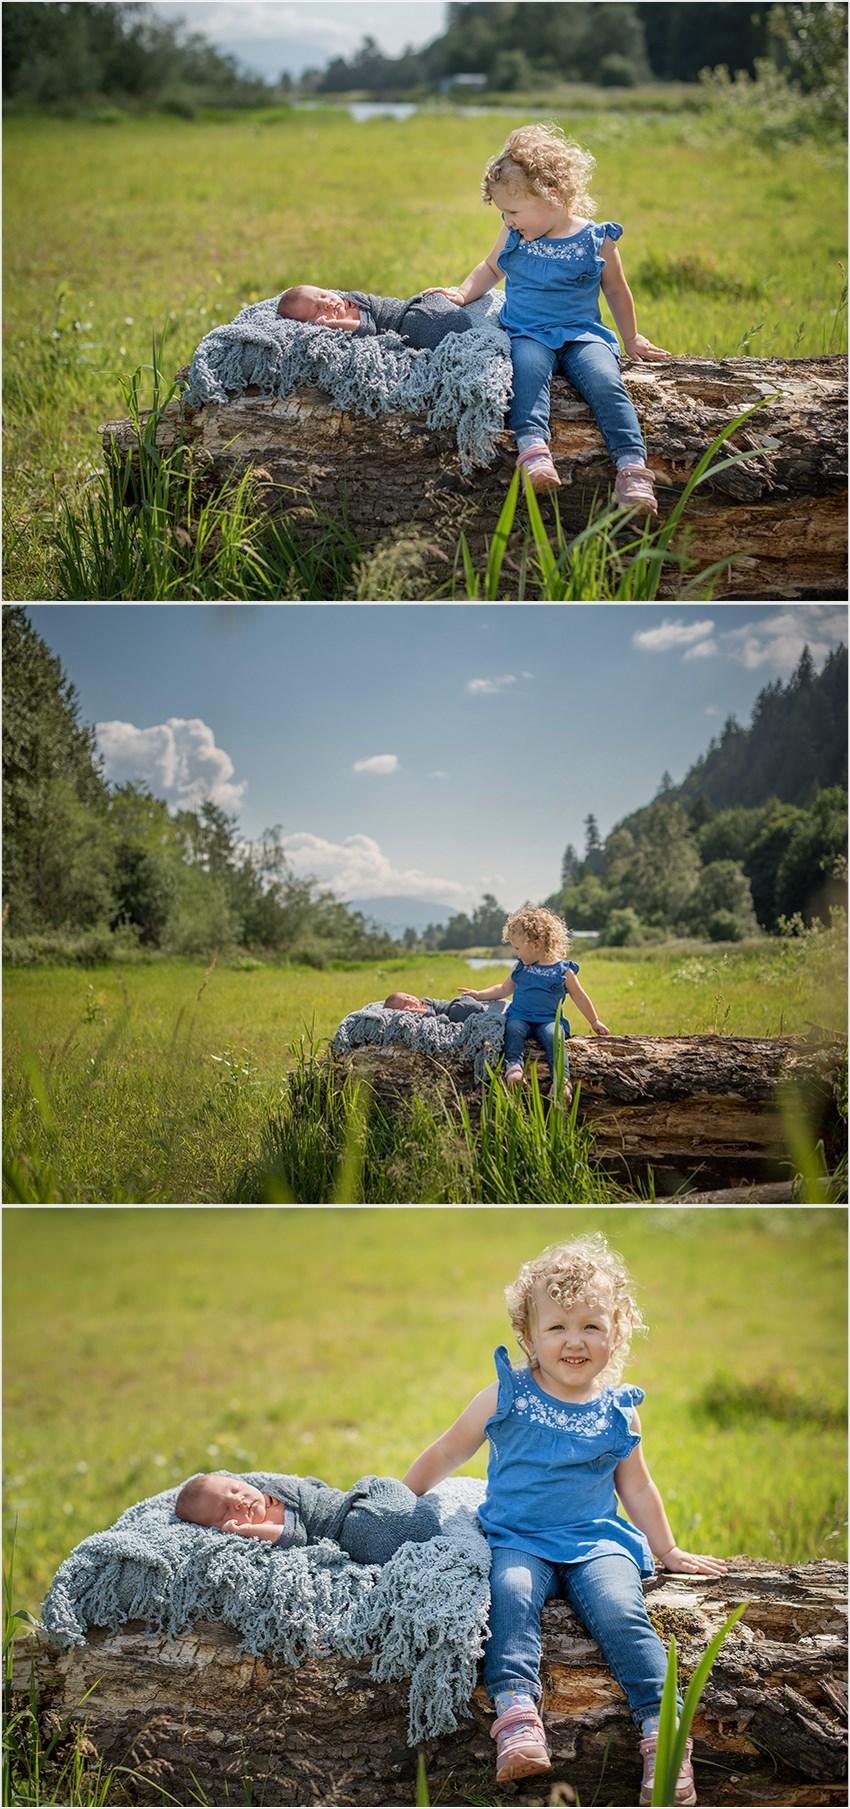 Baby Derrick Abbotsford Outdoor Newborn Photographer 003 (Side 3)